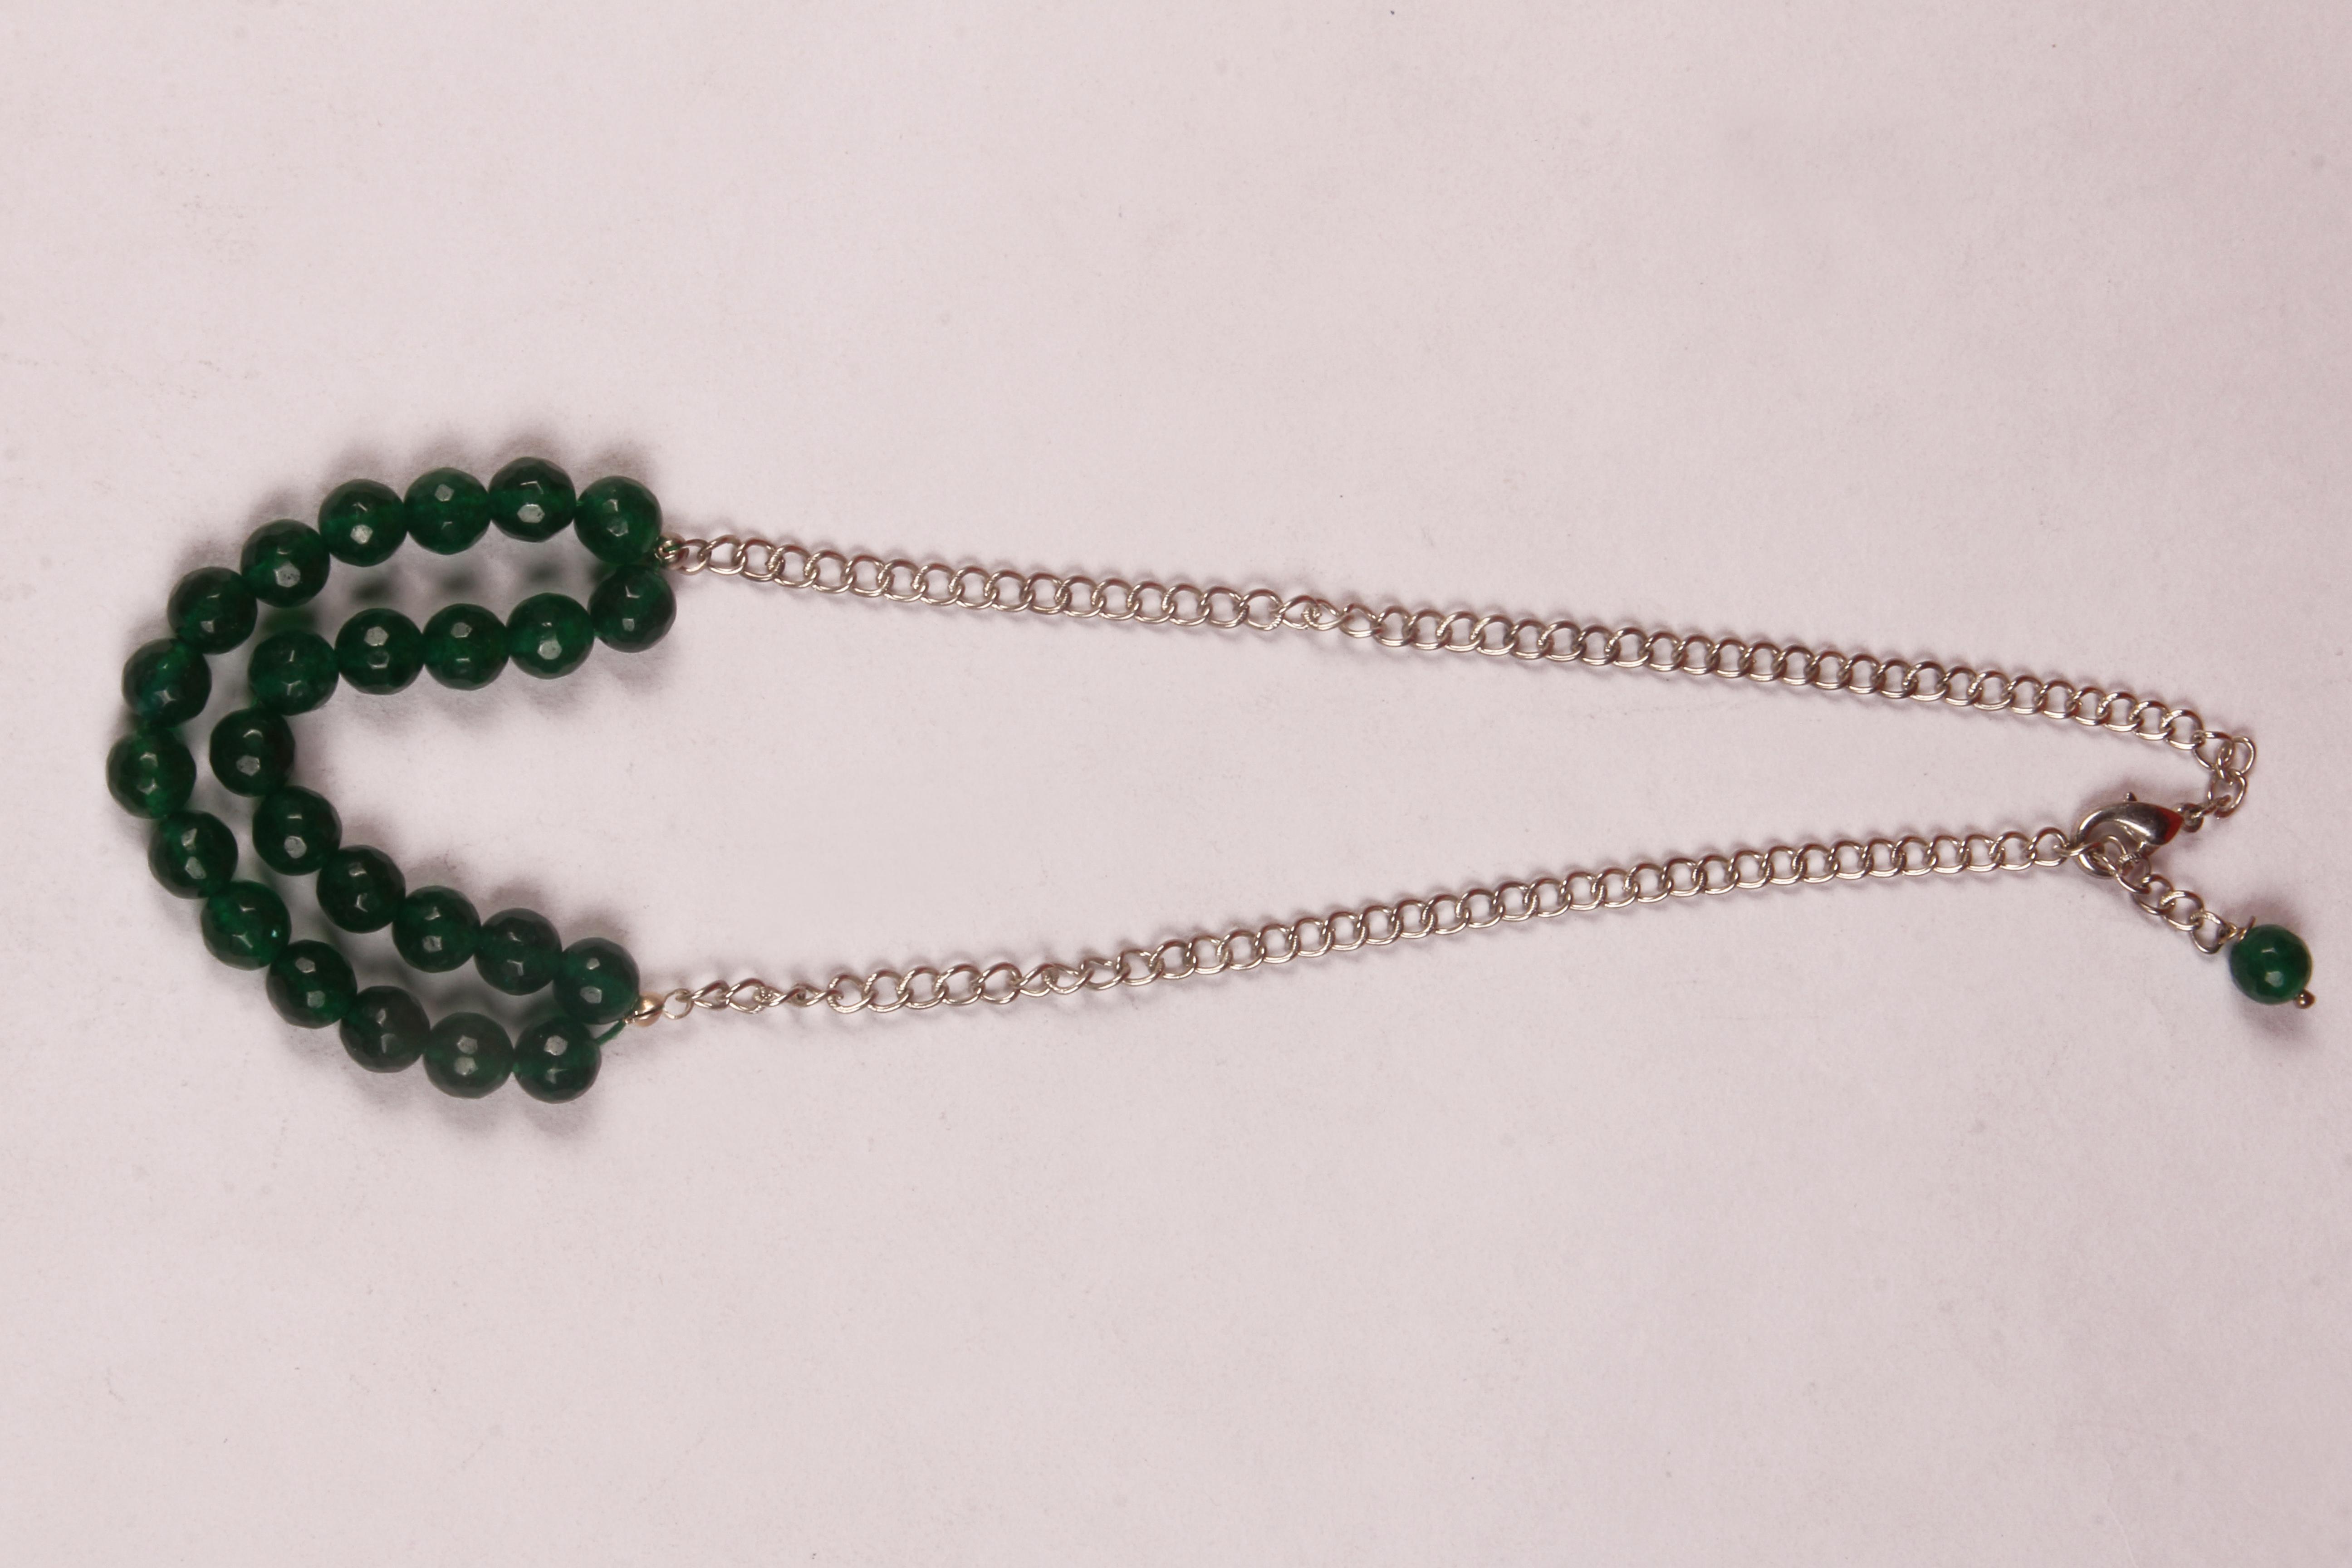 Green Jade Necklace